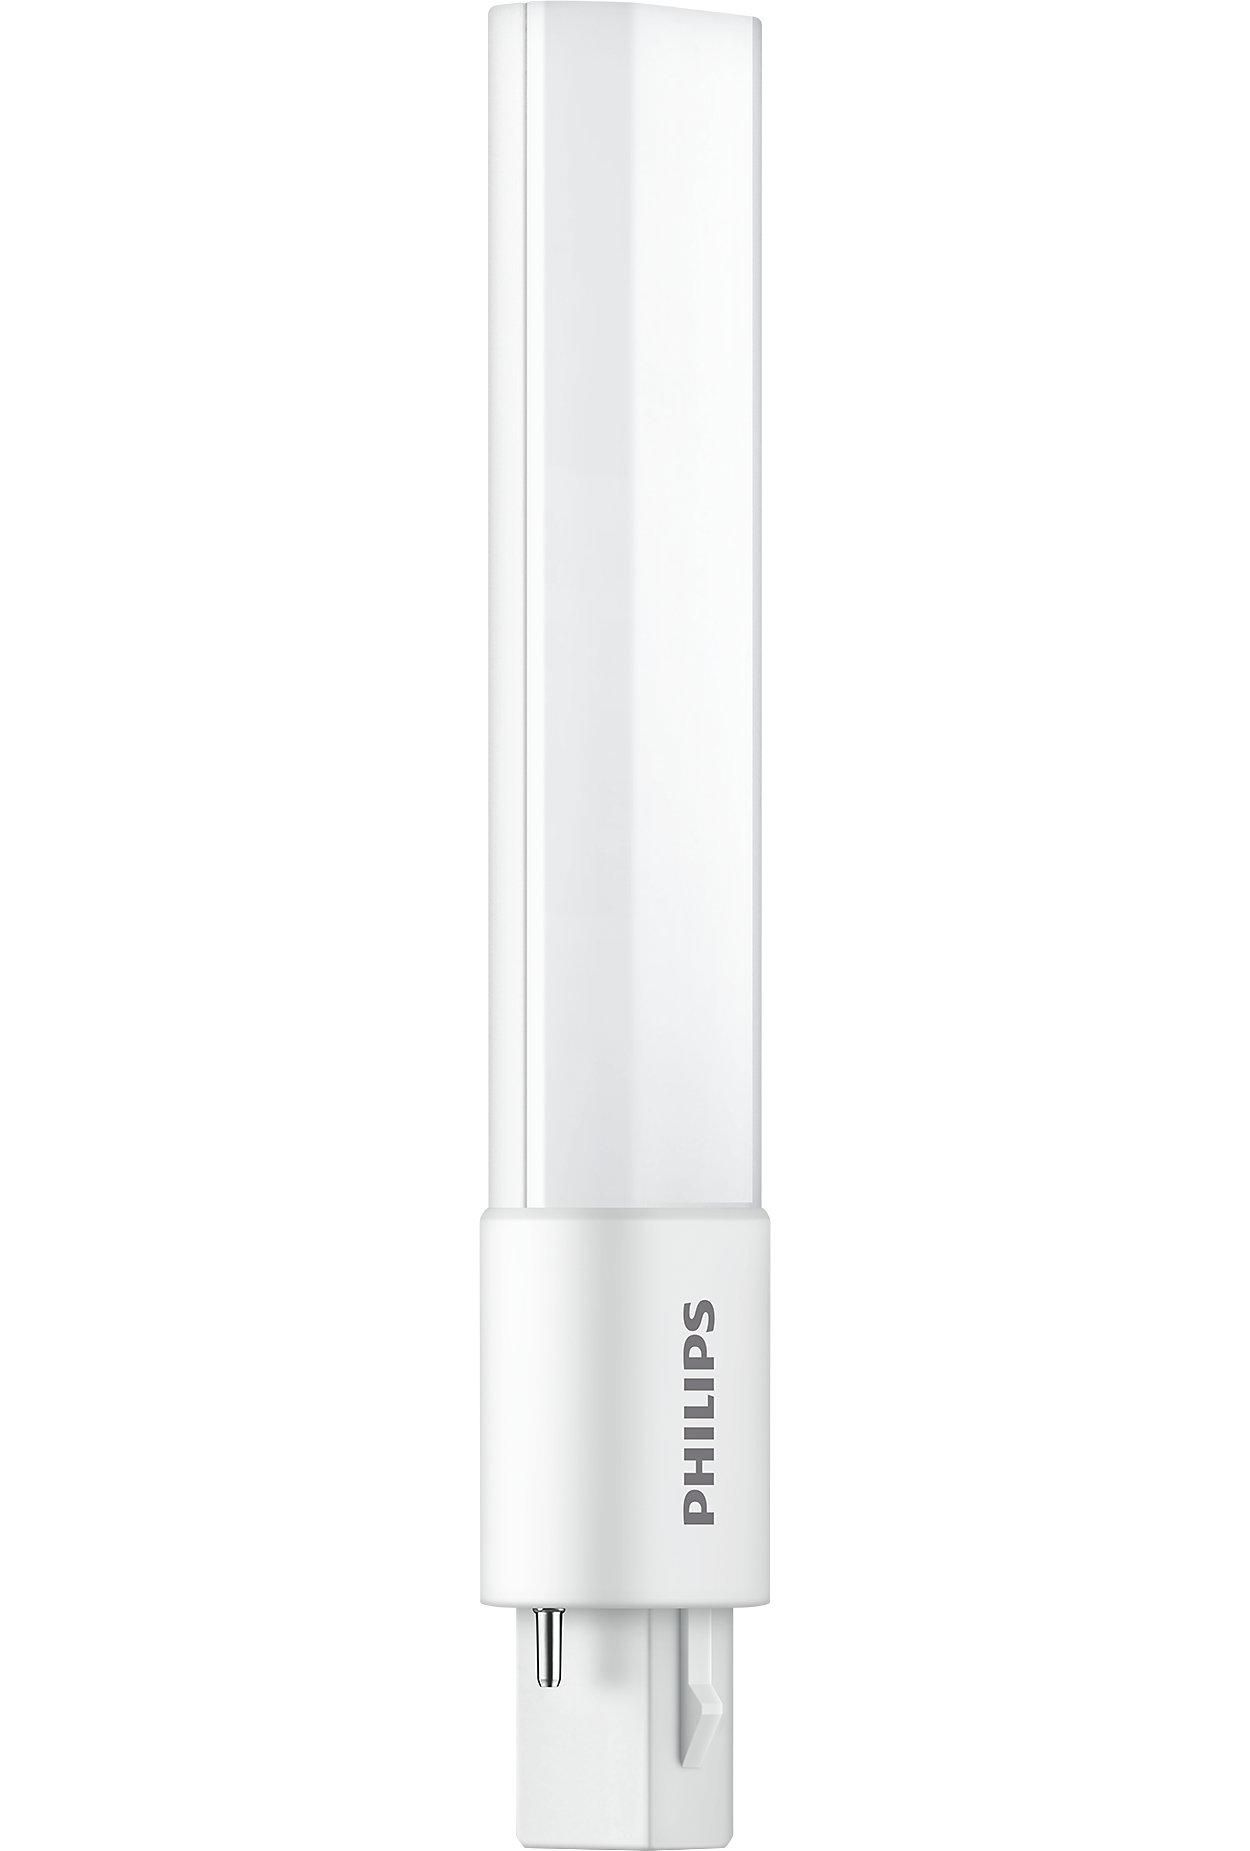 The new generation of energy-saving LED PLS tube lighting